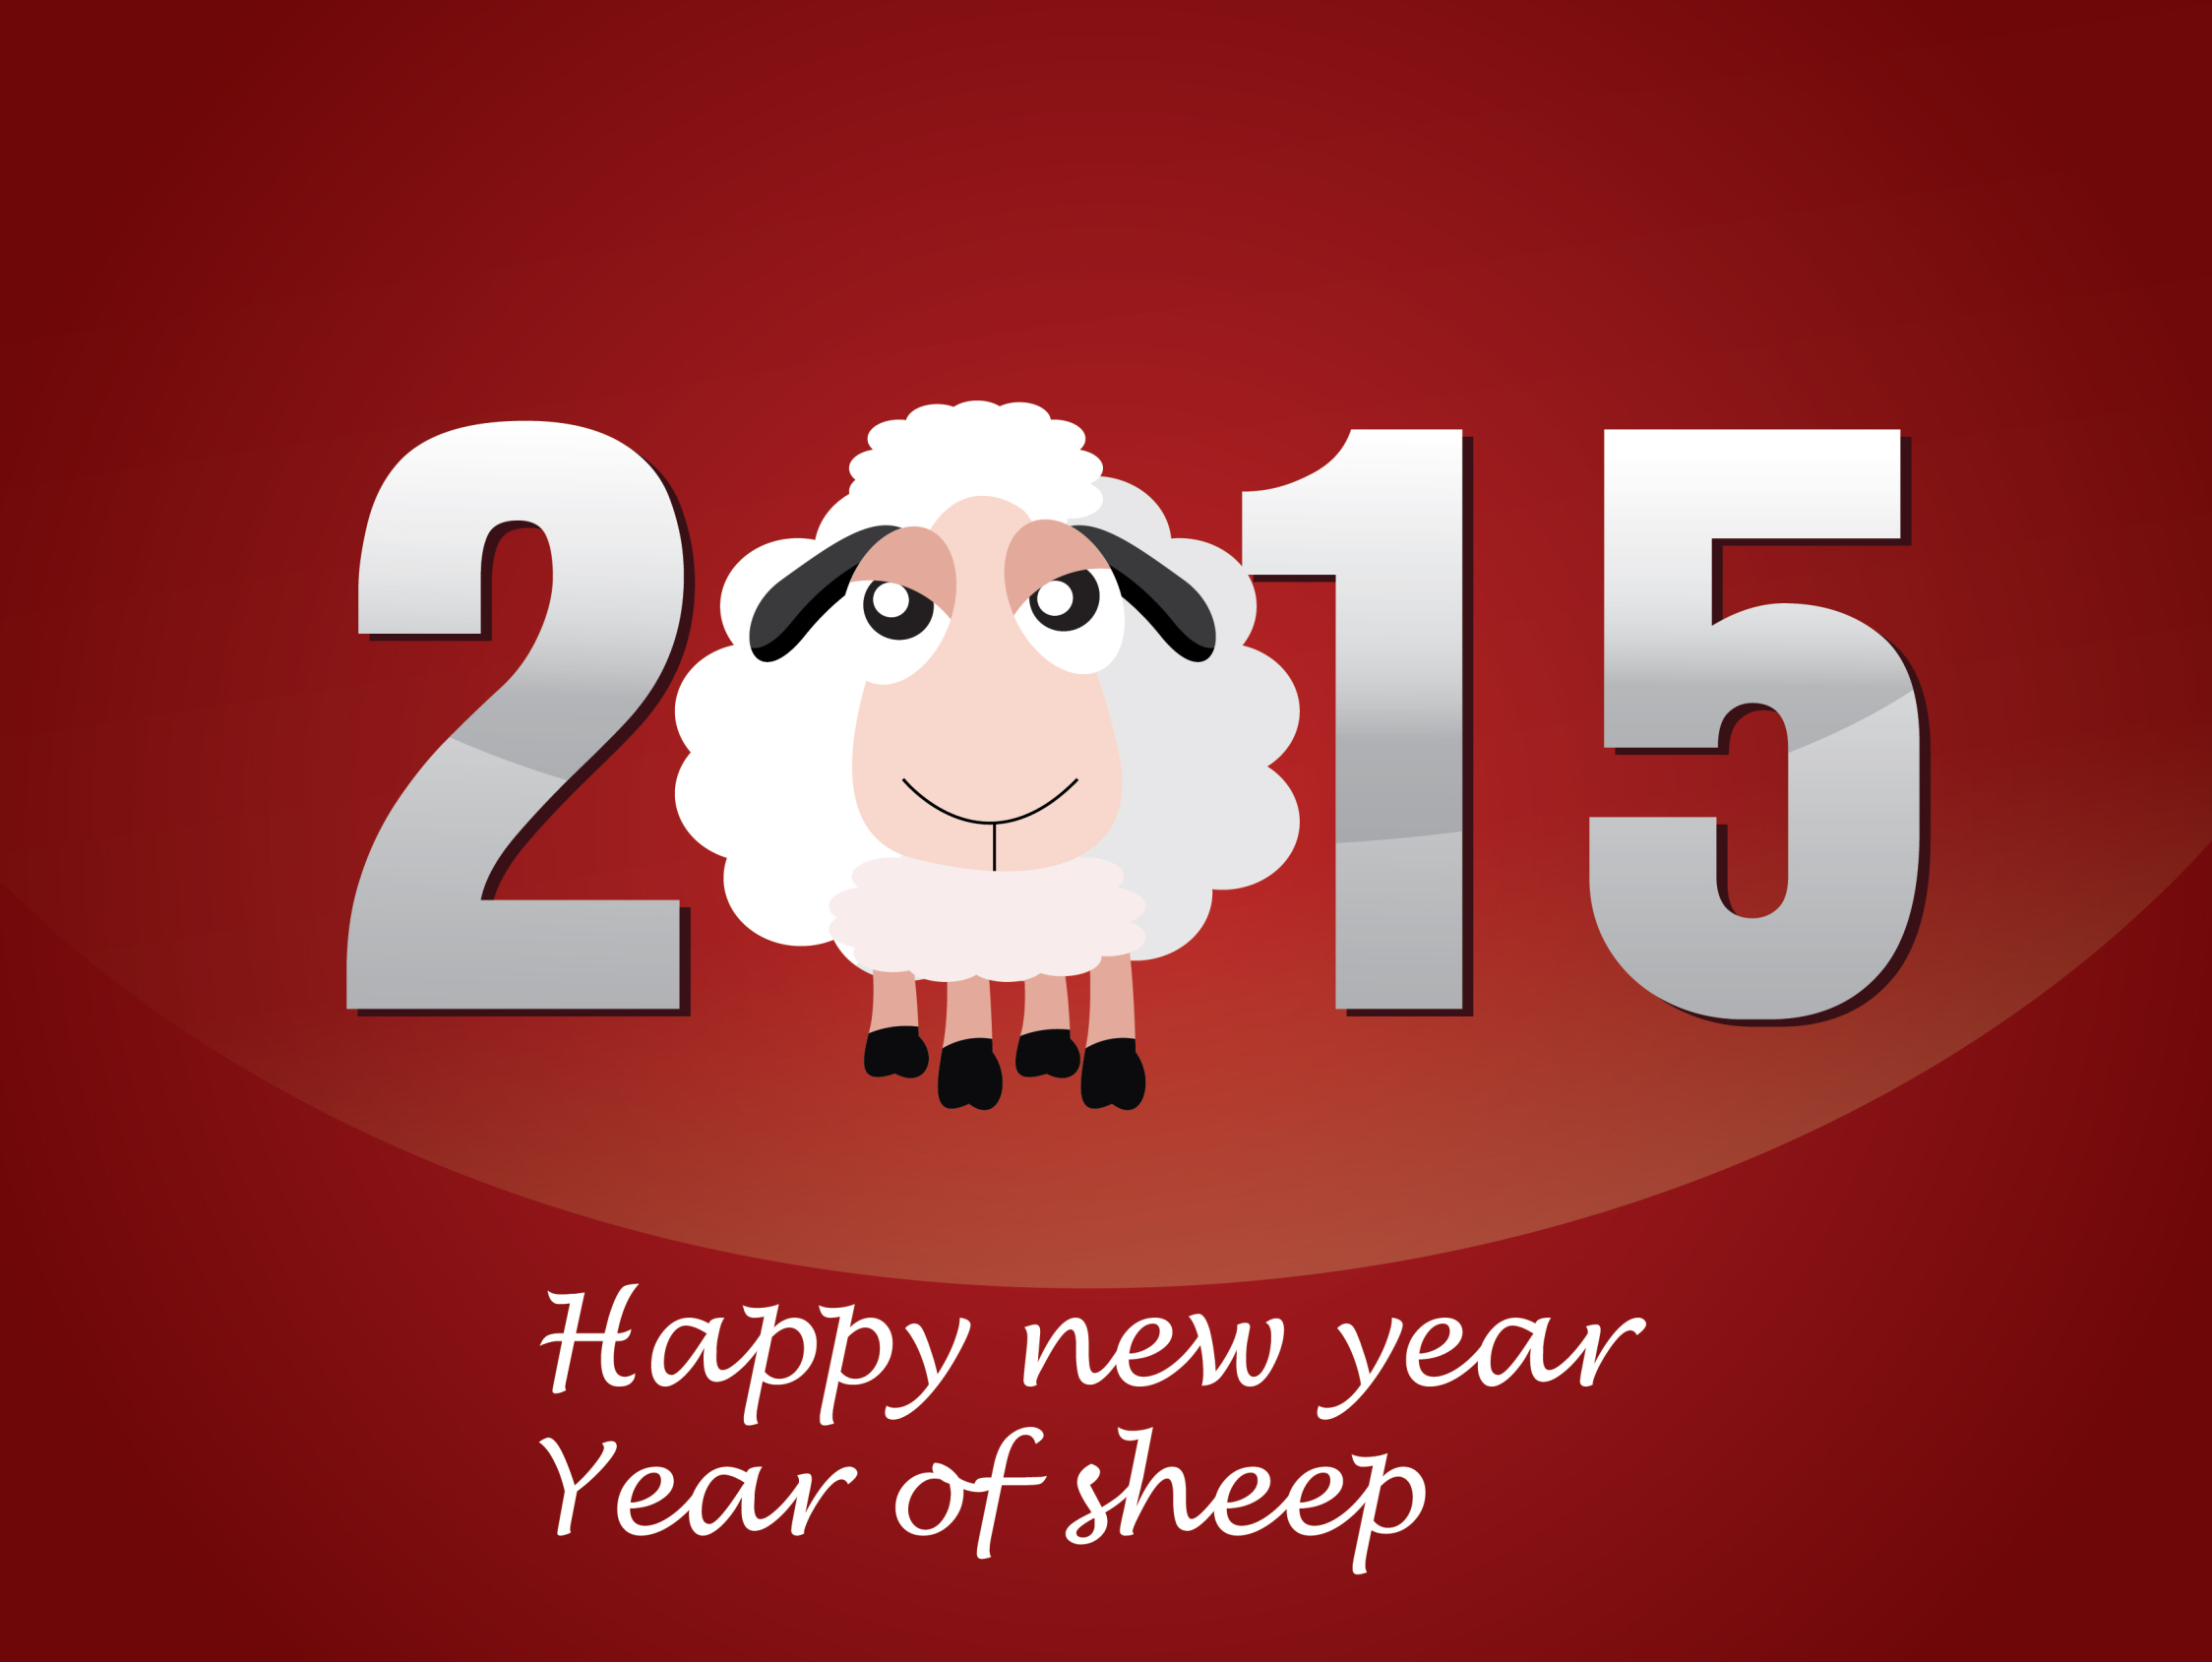 kozzi-happy_new_year_2015_year_of_sheep-2248x1690.jpg